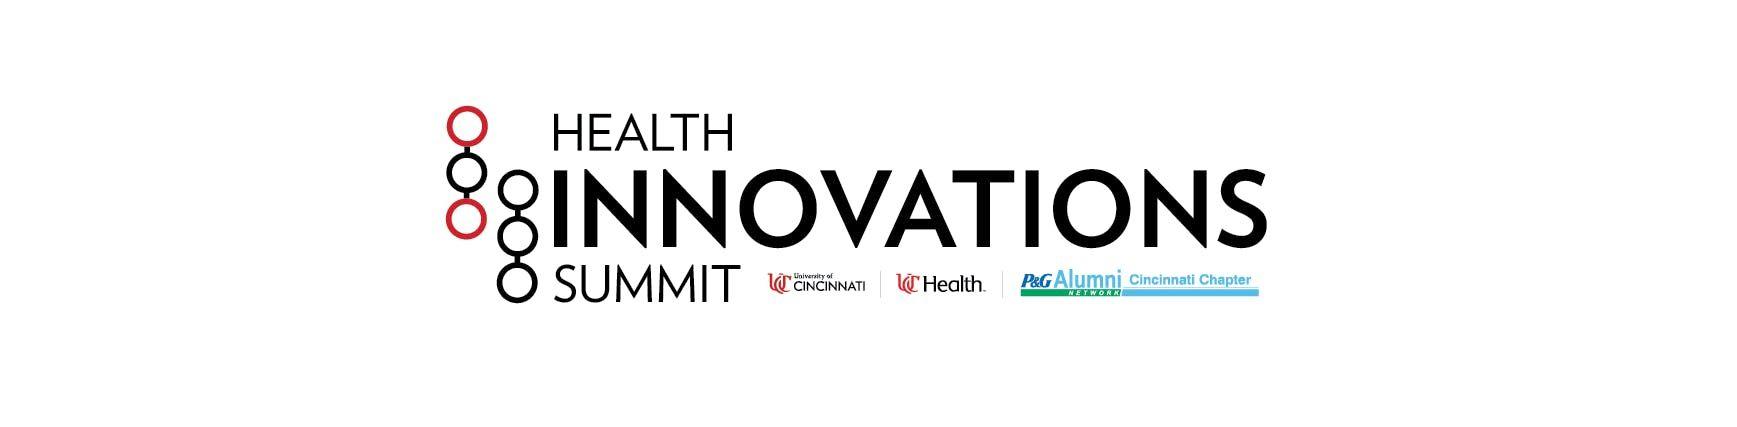 Health Innovations Summit